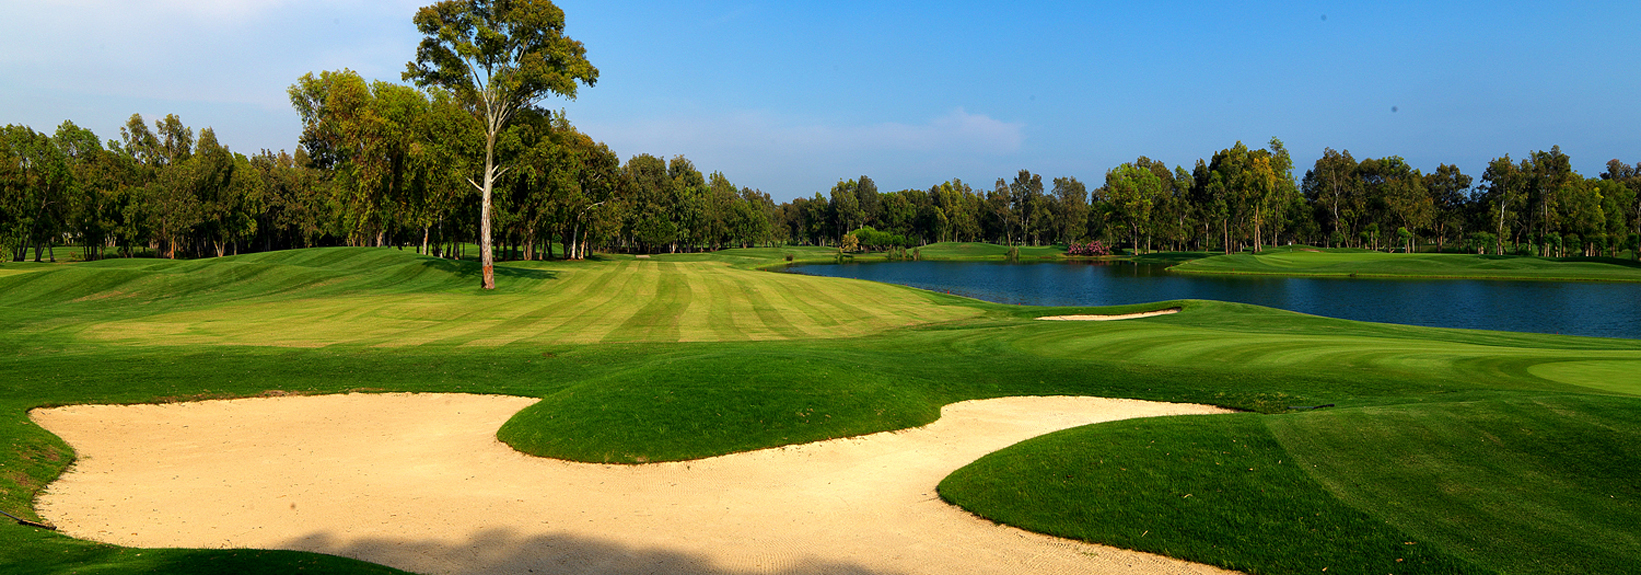 http://viajaegipto.es/wp-content/uploads/2012/09/golf-en-egipto-viajes-a-egipto-kempinski-golf-resort.jpg